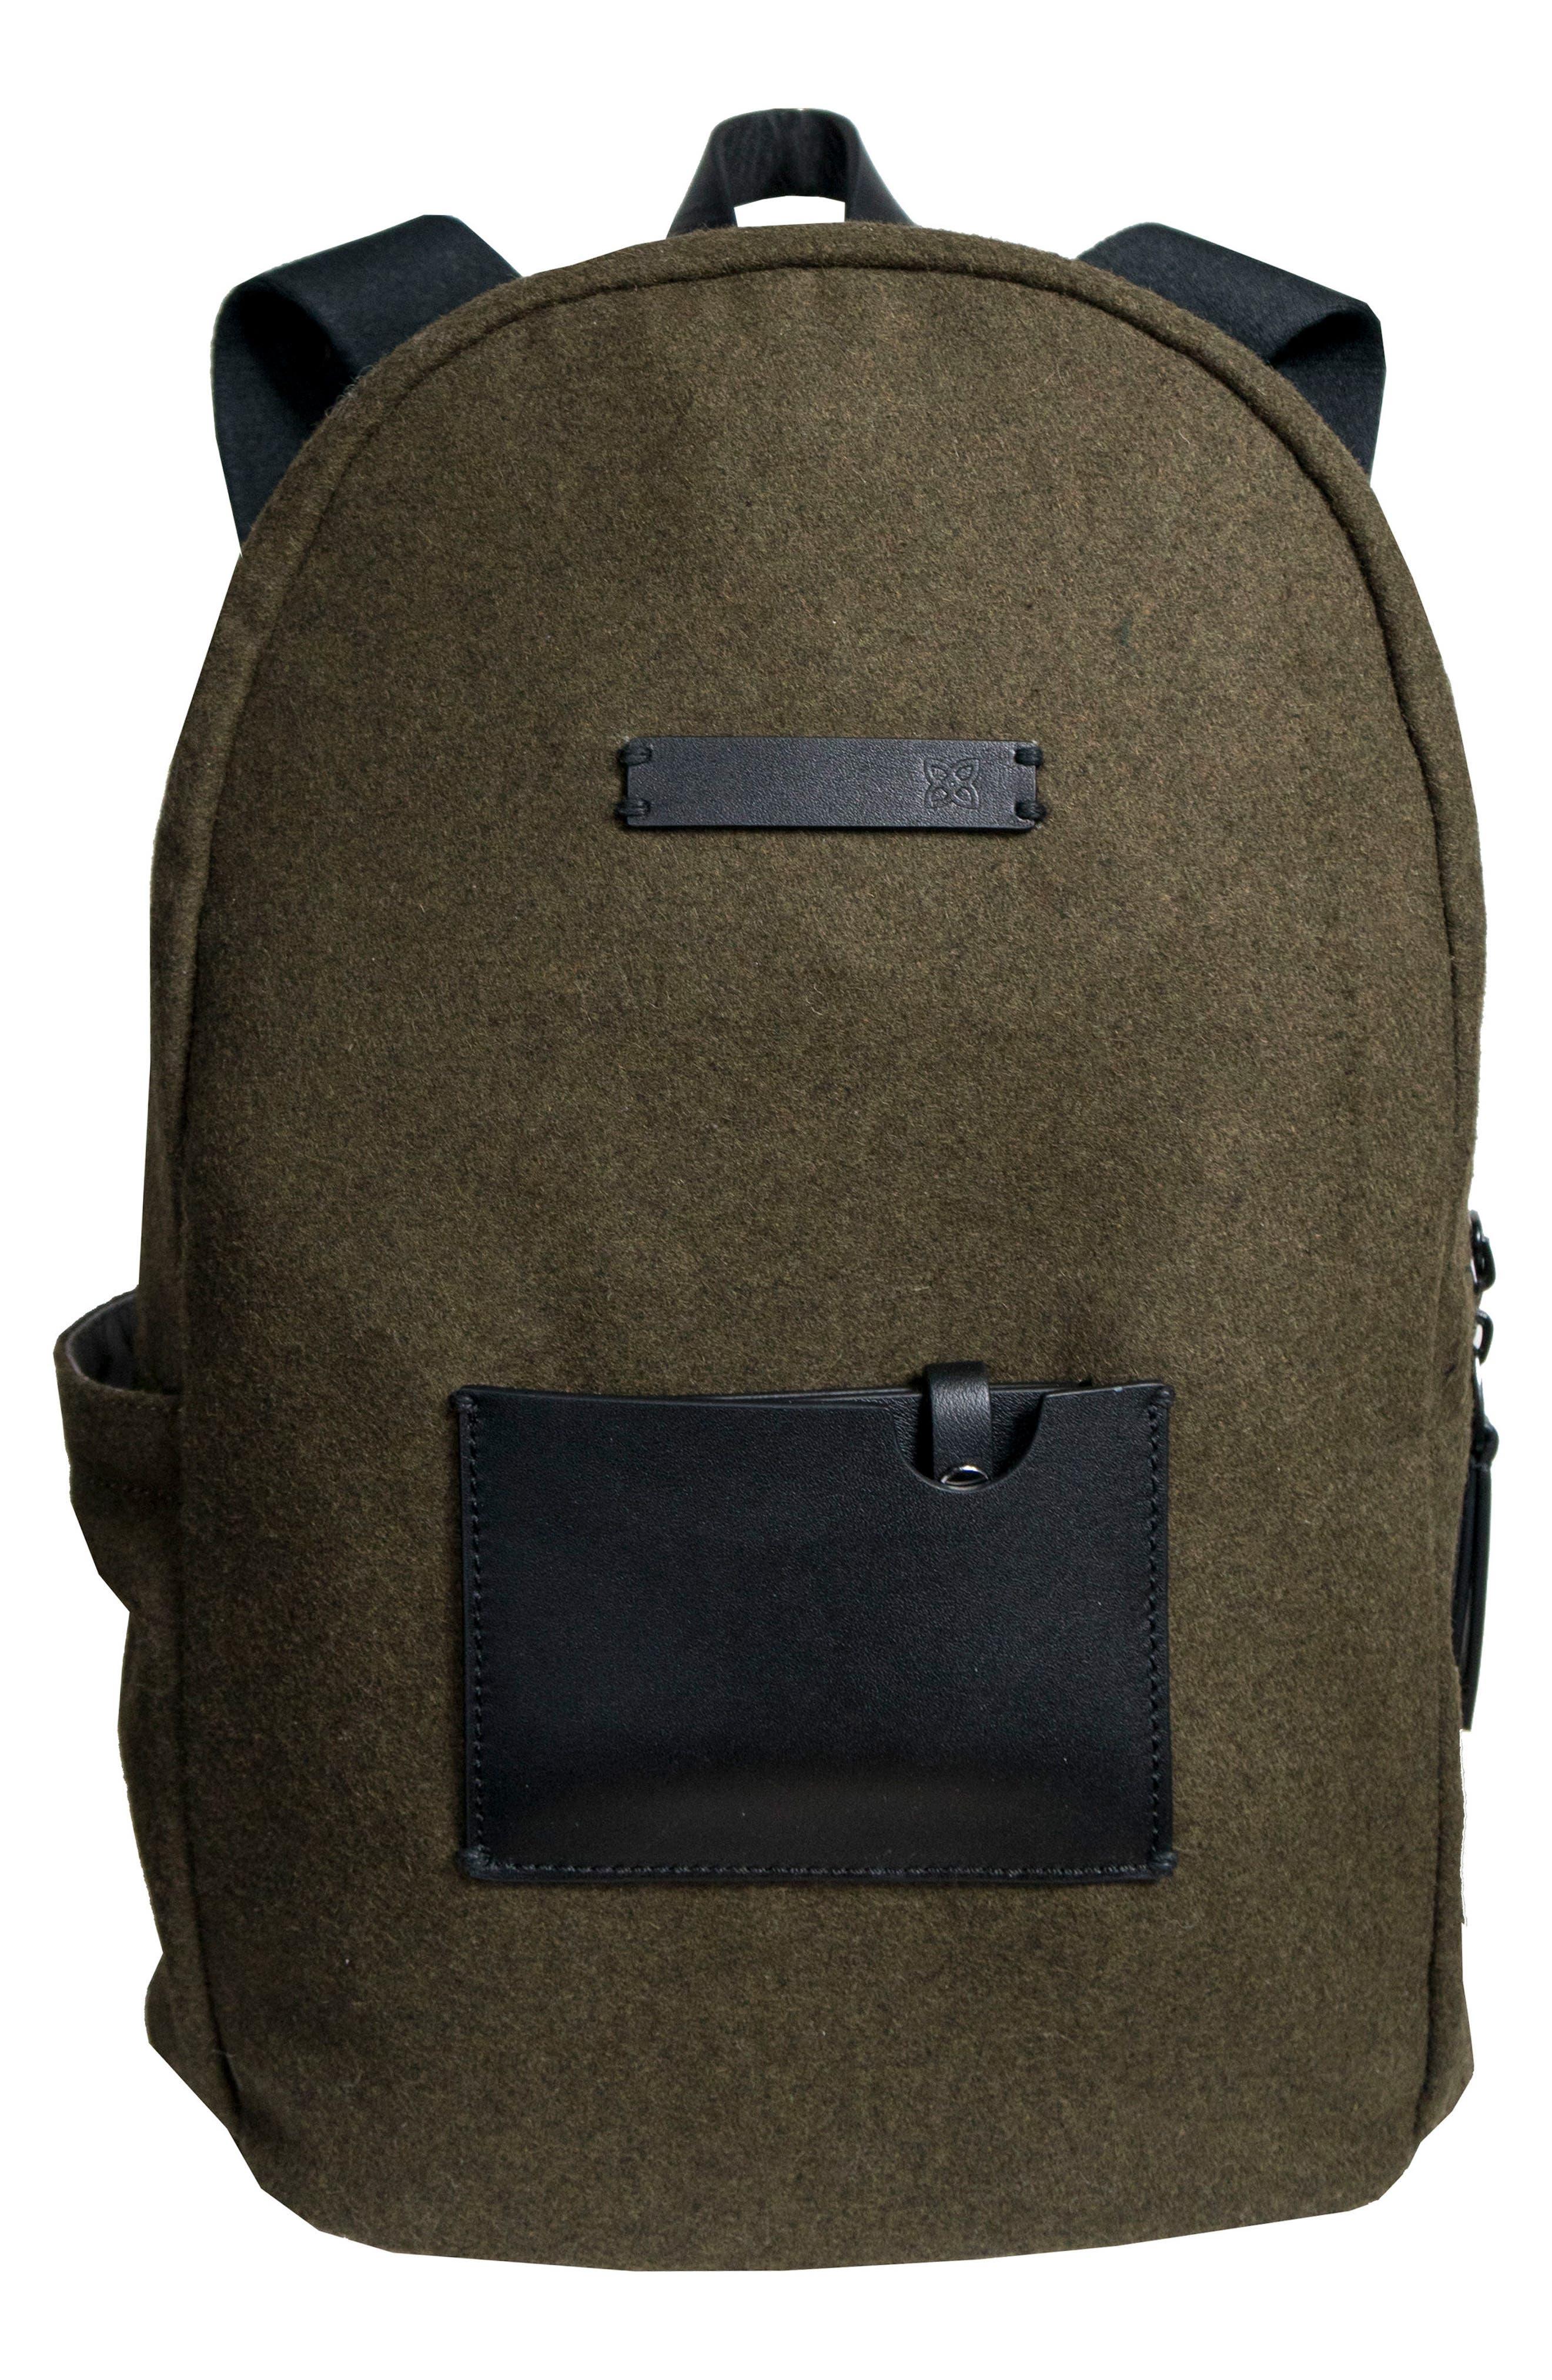 Main Image - Sherpani Indie Boiled Wool Backpack